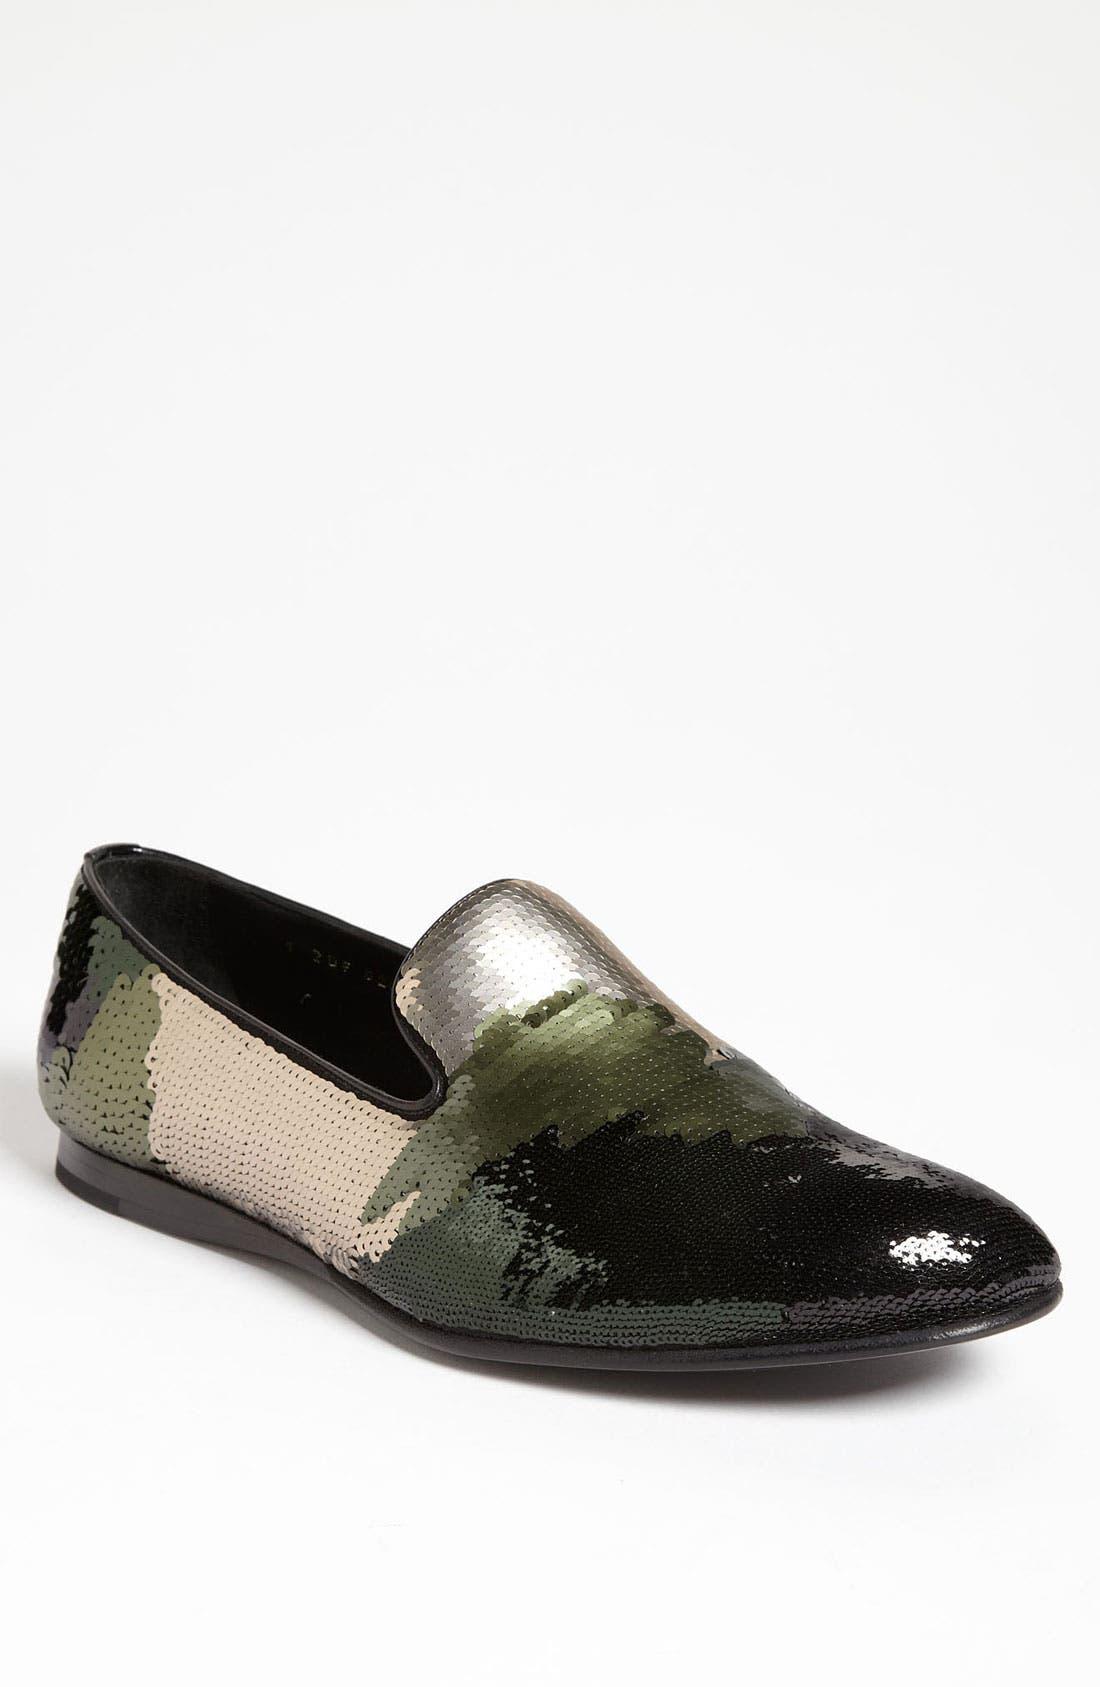 Alternate Image 1 Selected - Prada Sequin Slipper